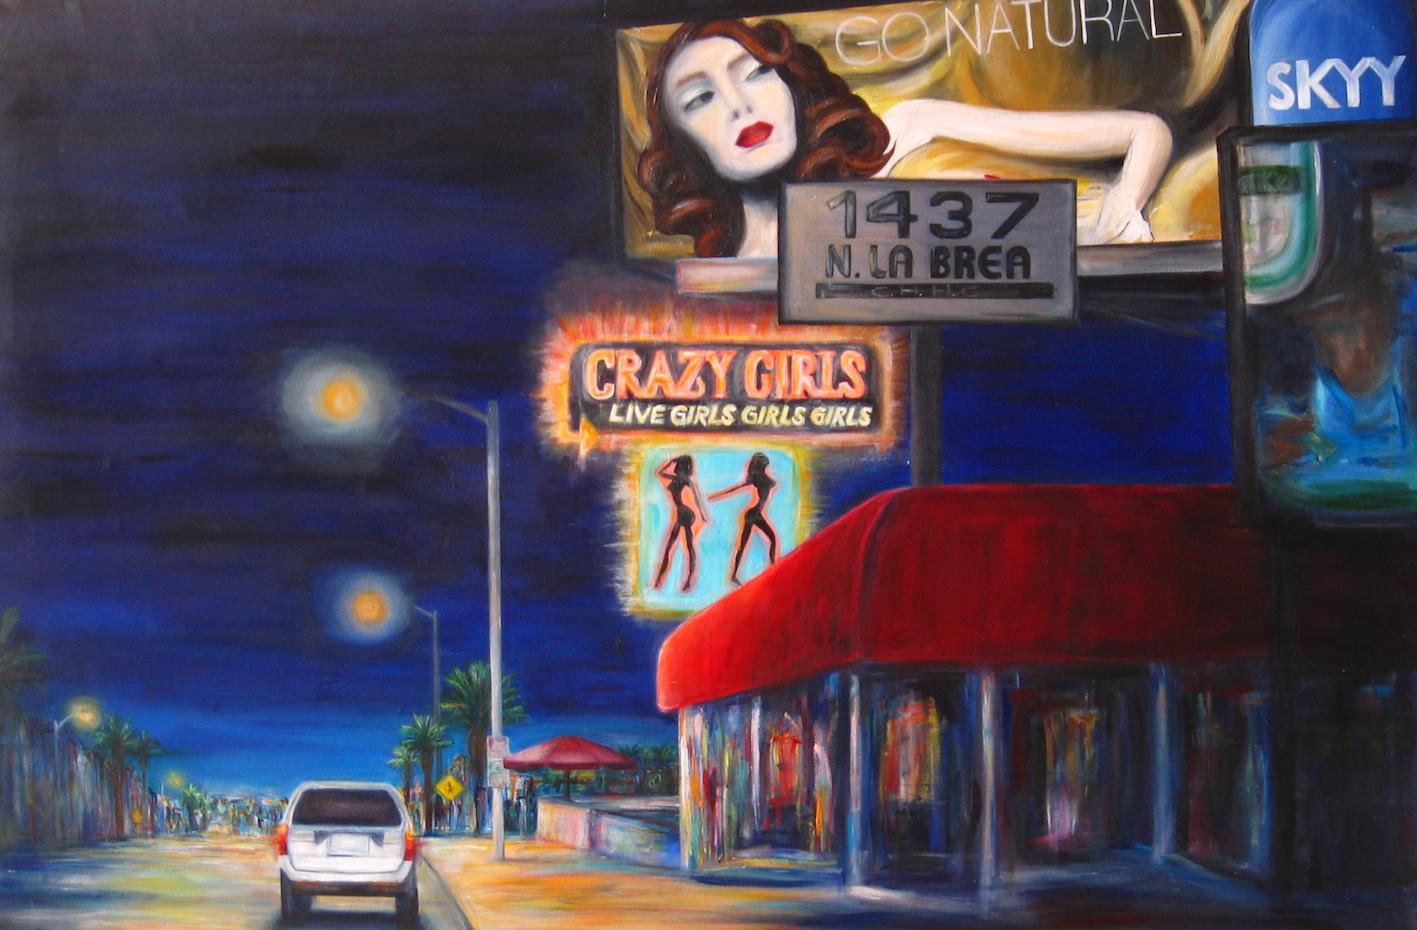 Hollywood (N. La Brea Ave)